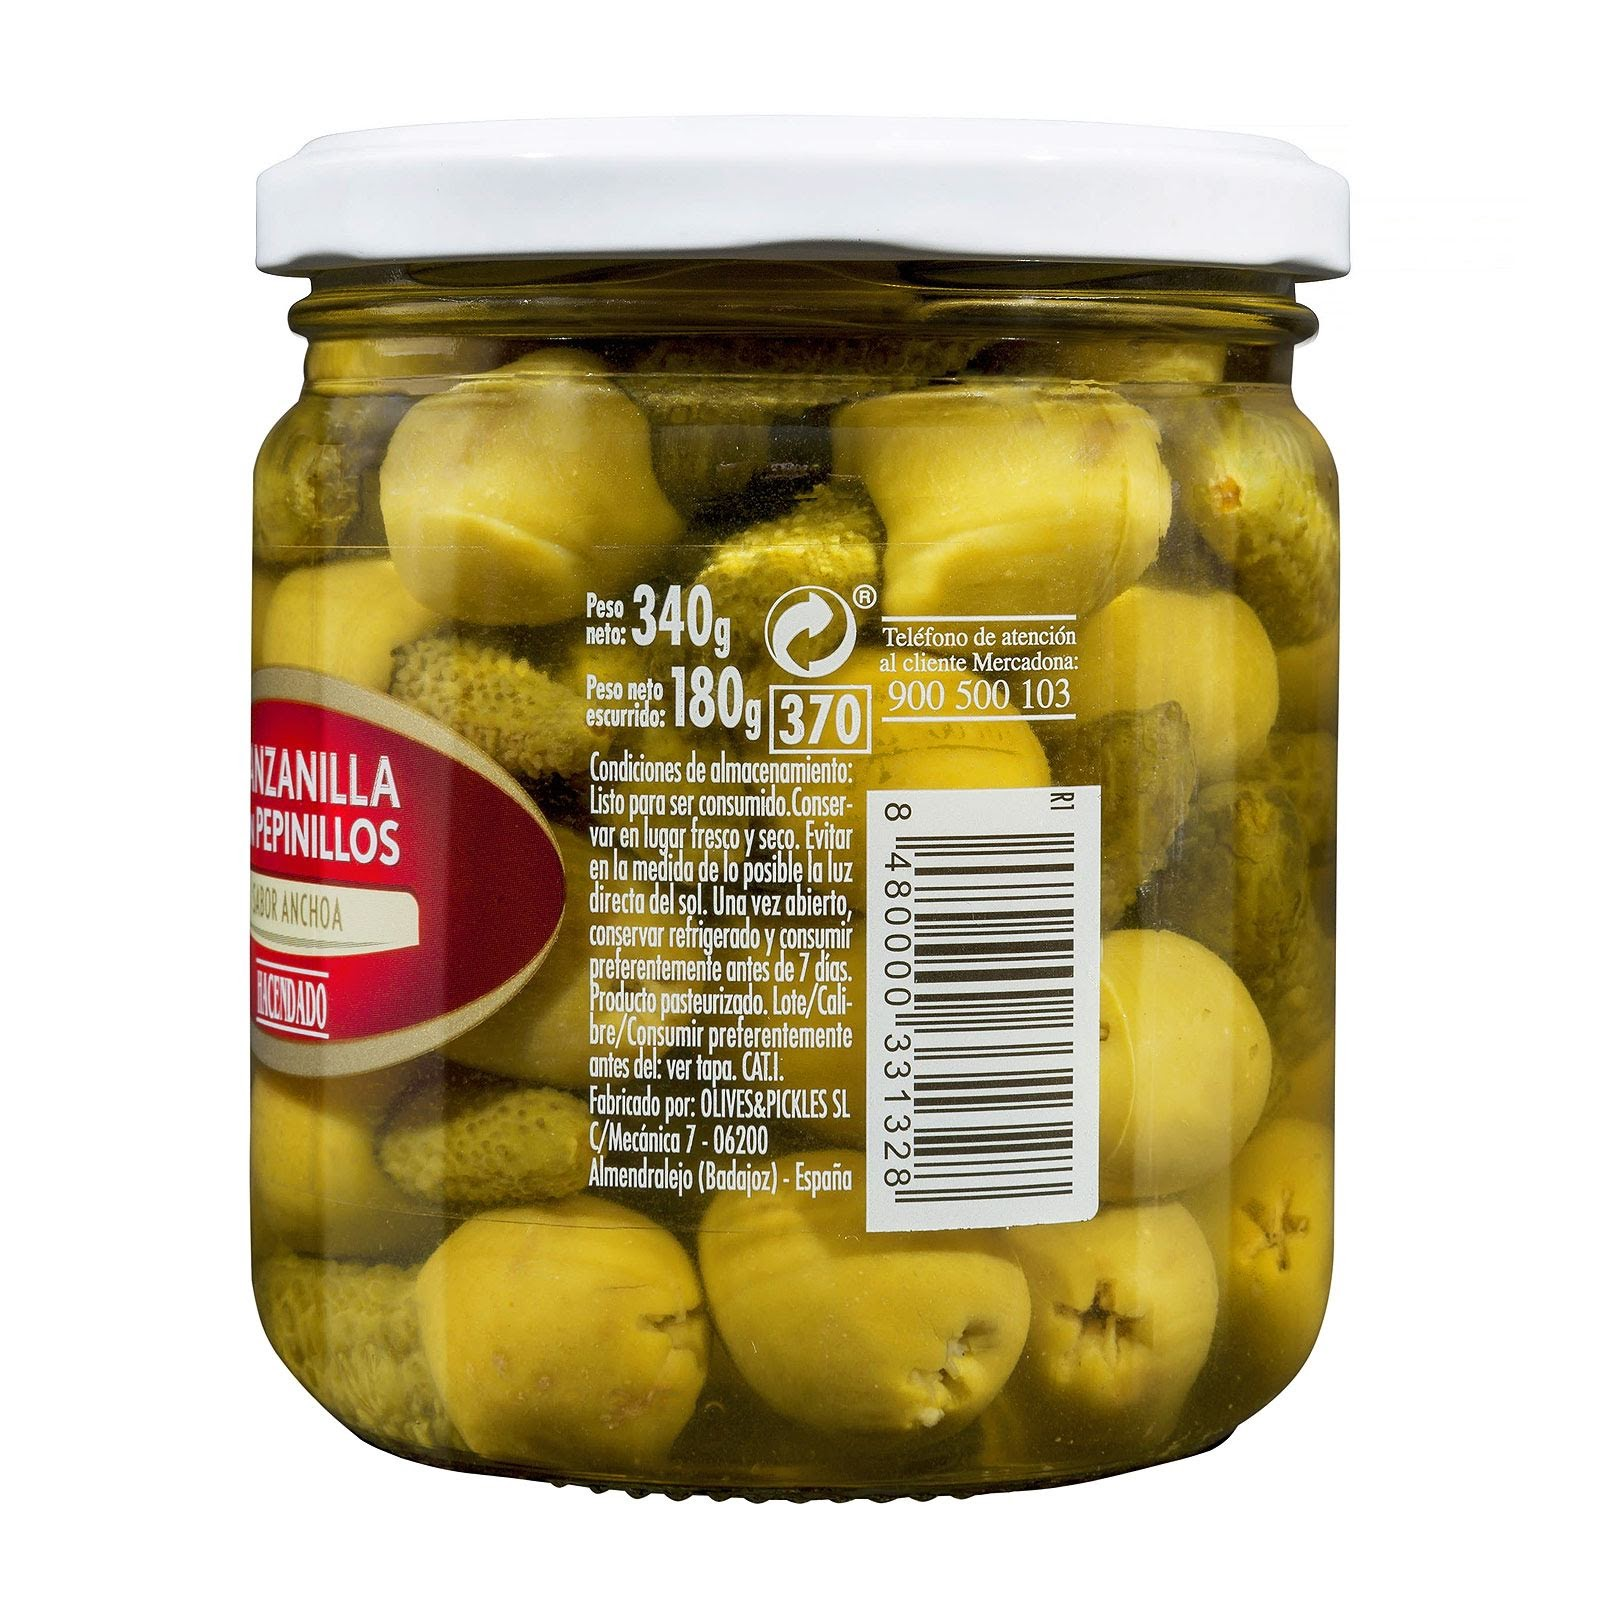 Aceitunas verdes manzanilla con pepinillos sabor anchoa Hacendado